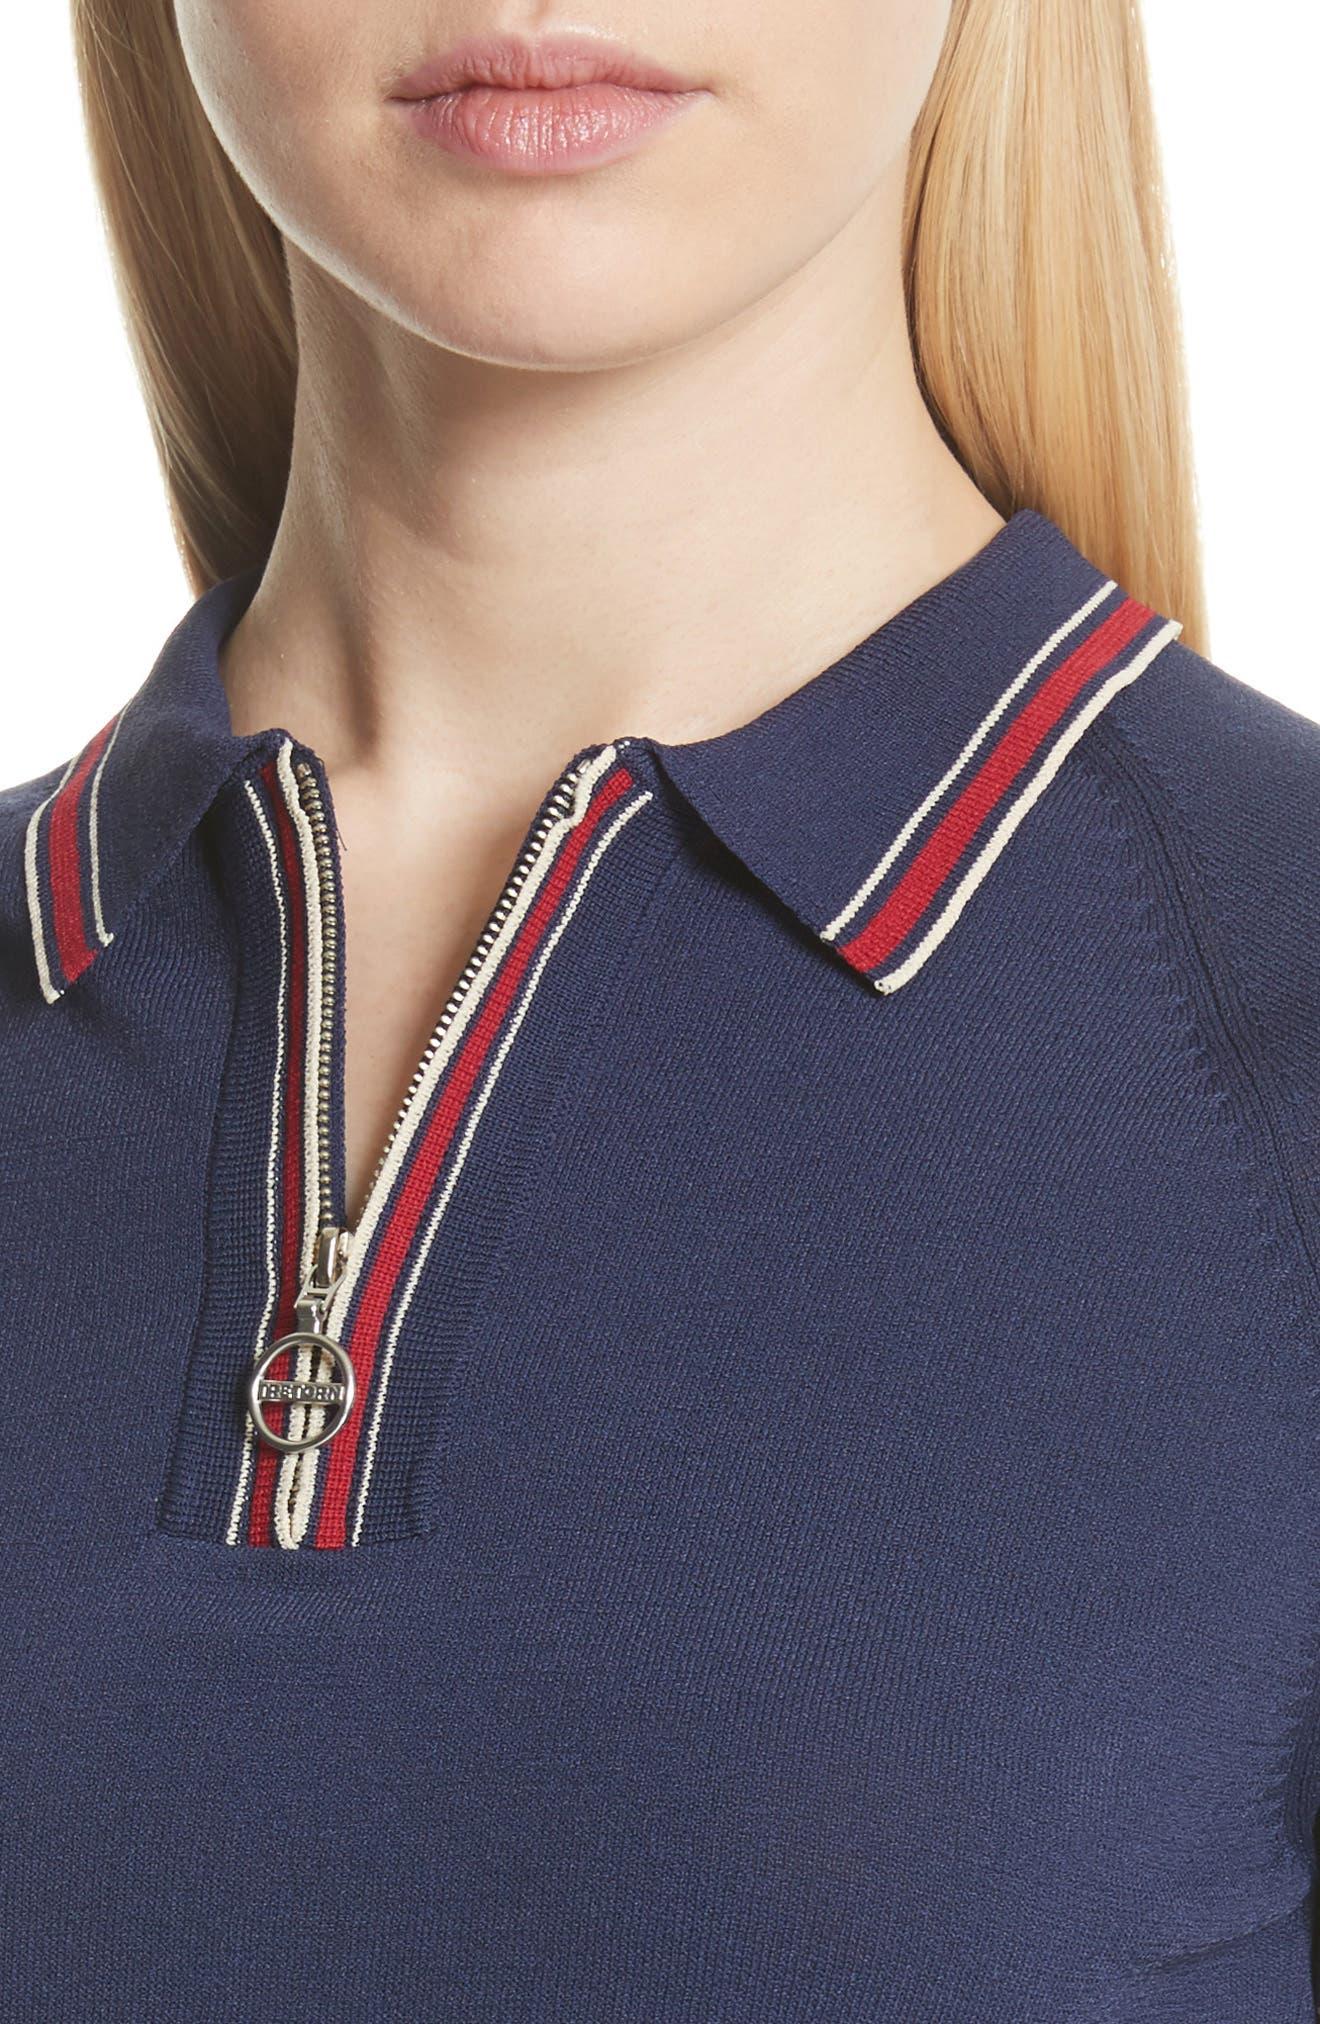 Zip Polo,                             Alternate thumbnail 4, color,                             Navy